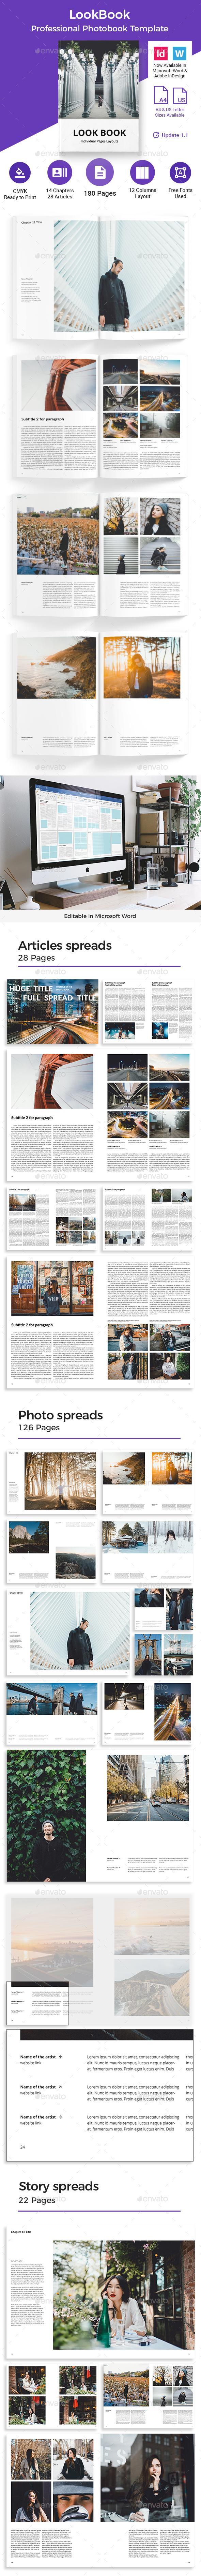 Look Book Multipurpose Template - Magazines Print Templates